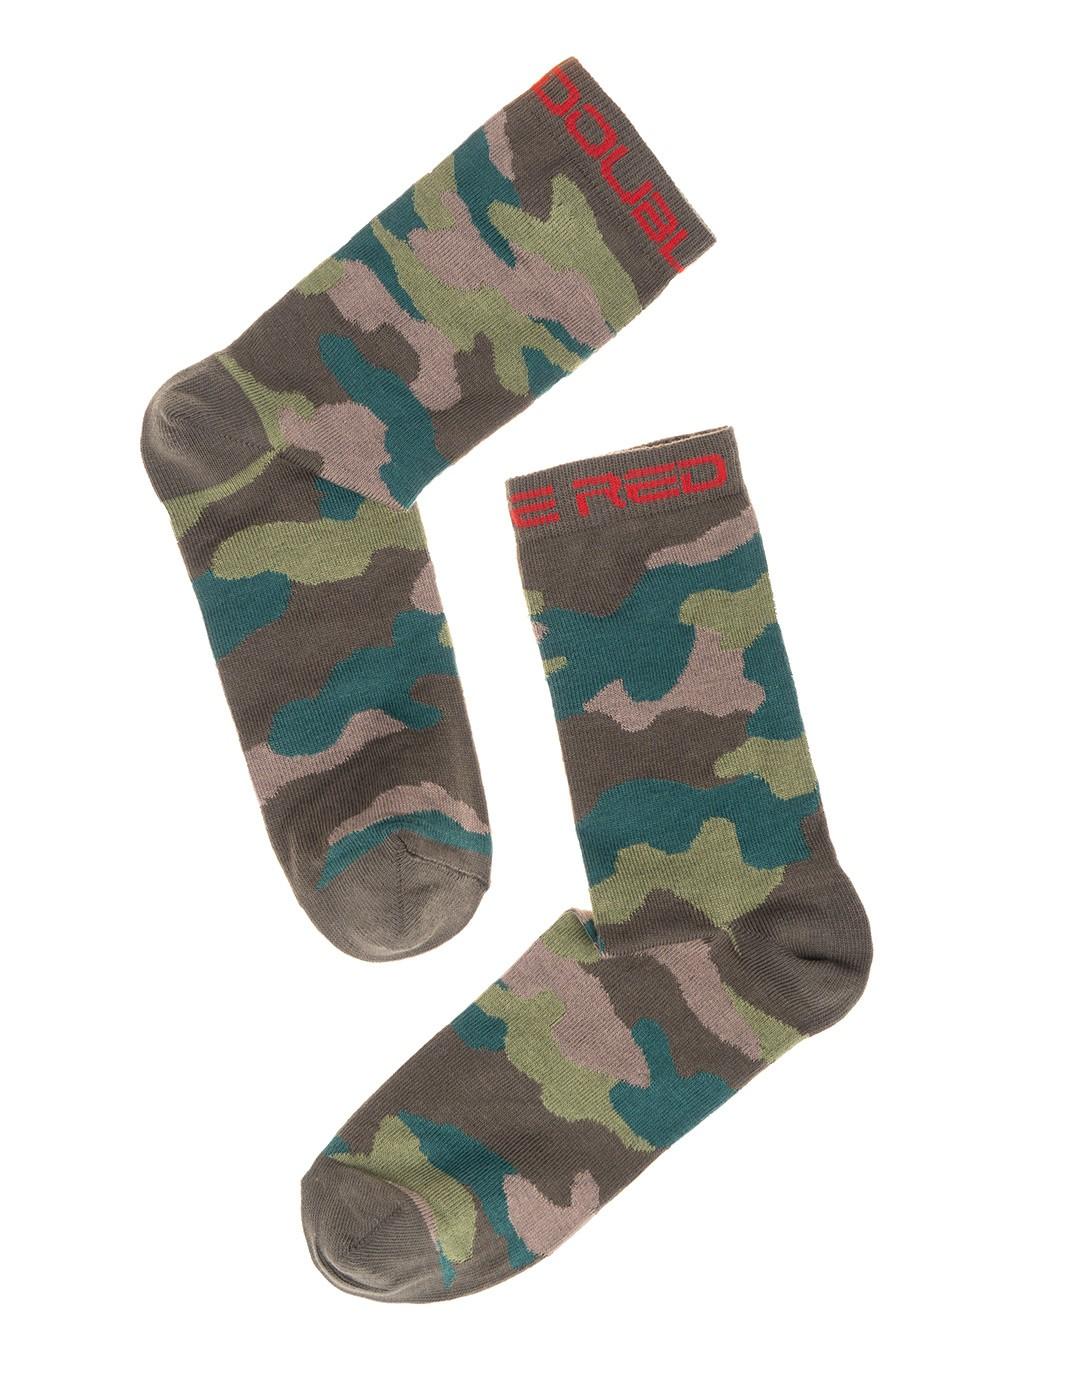 DOUBLE FUN Socks Camouflage